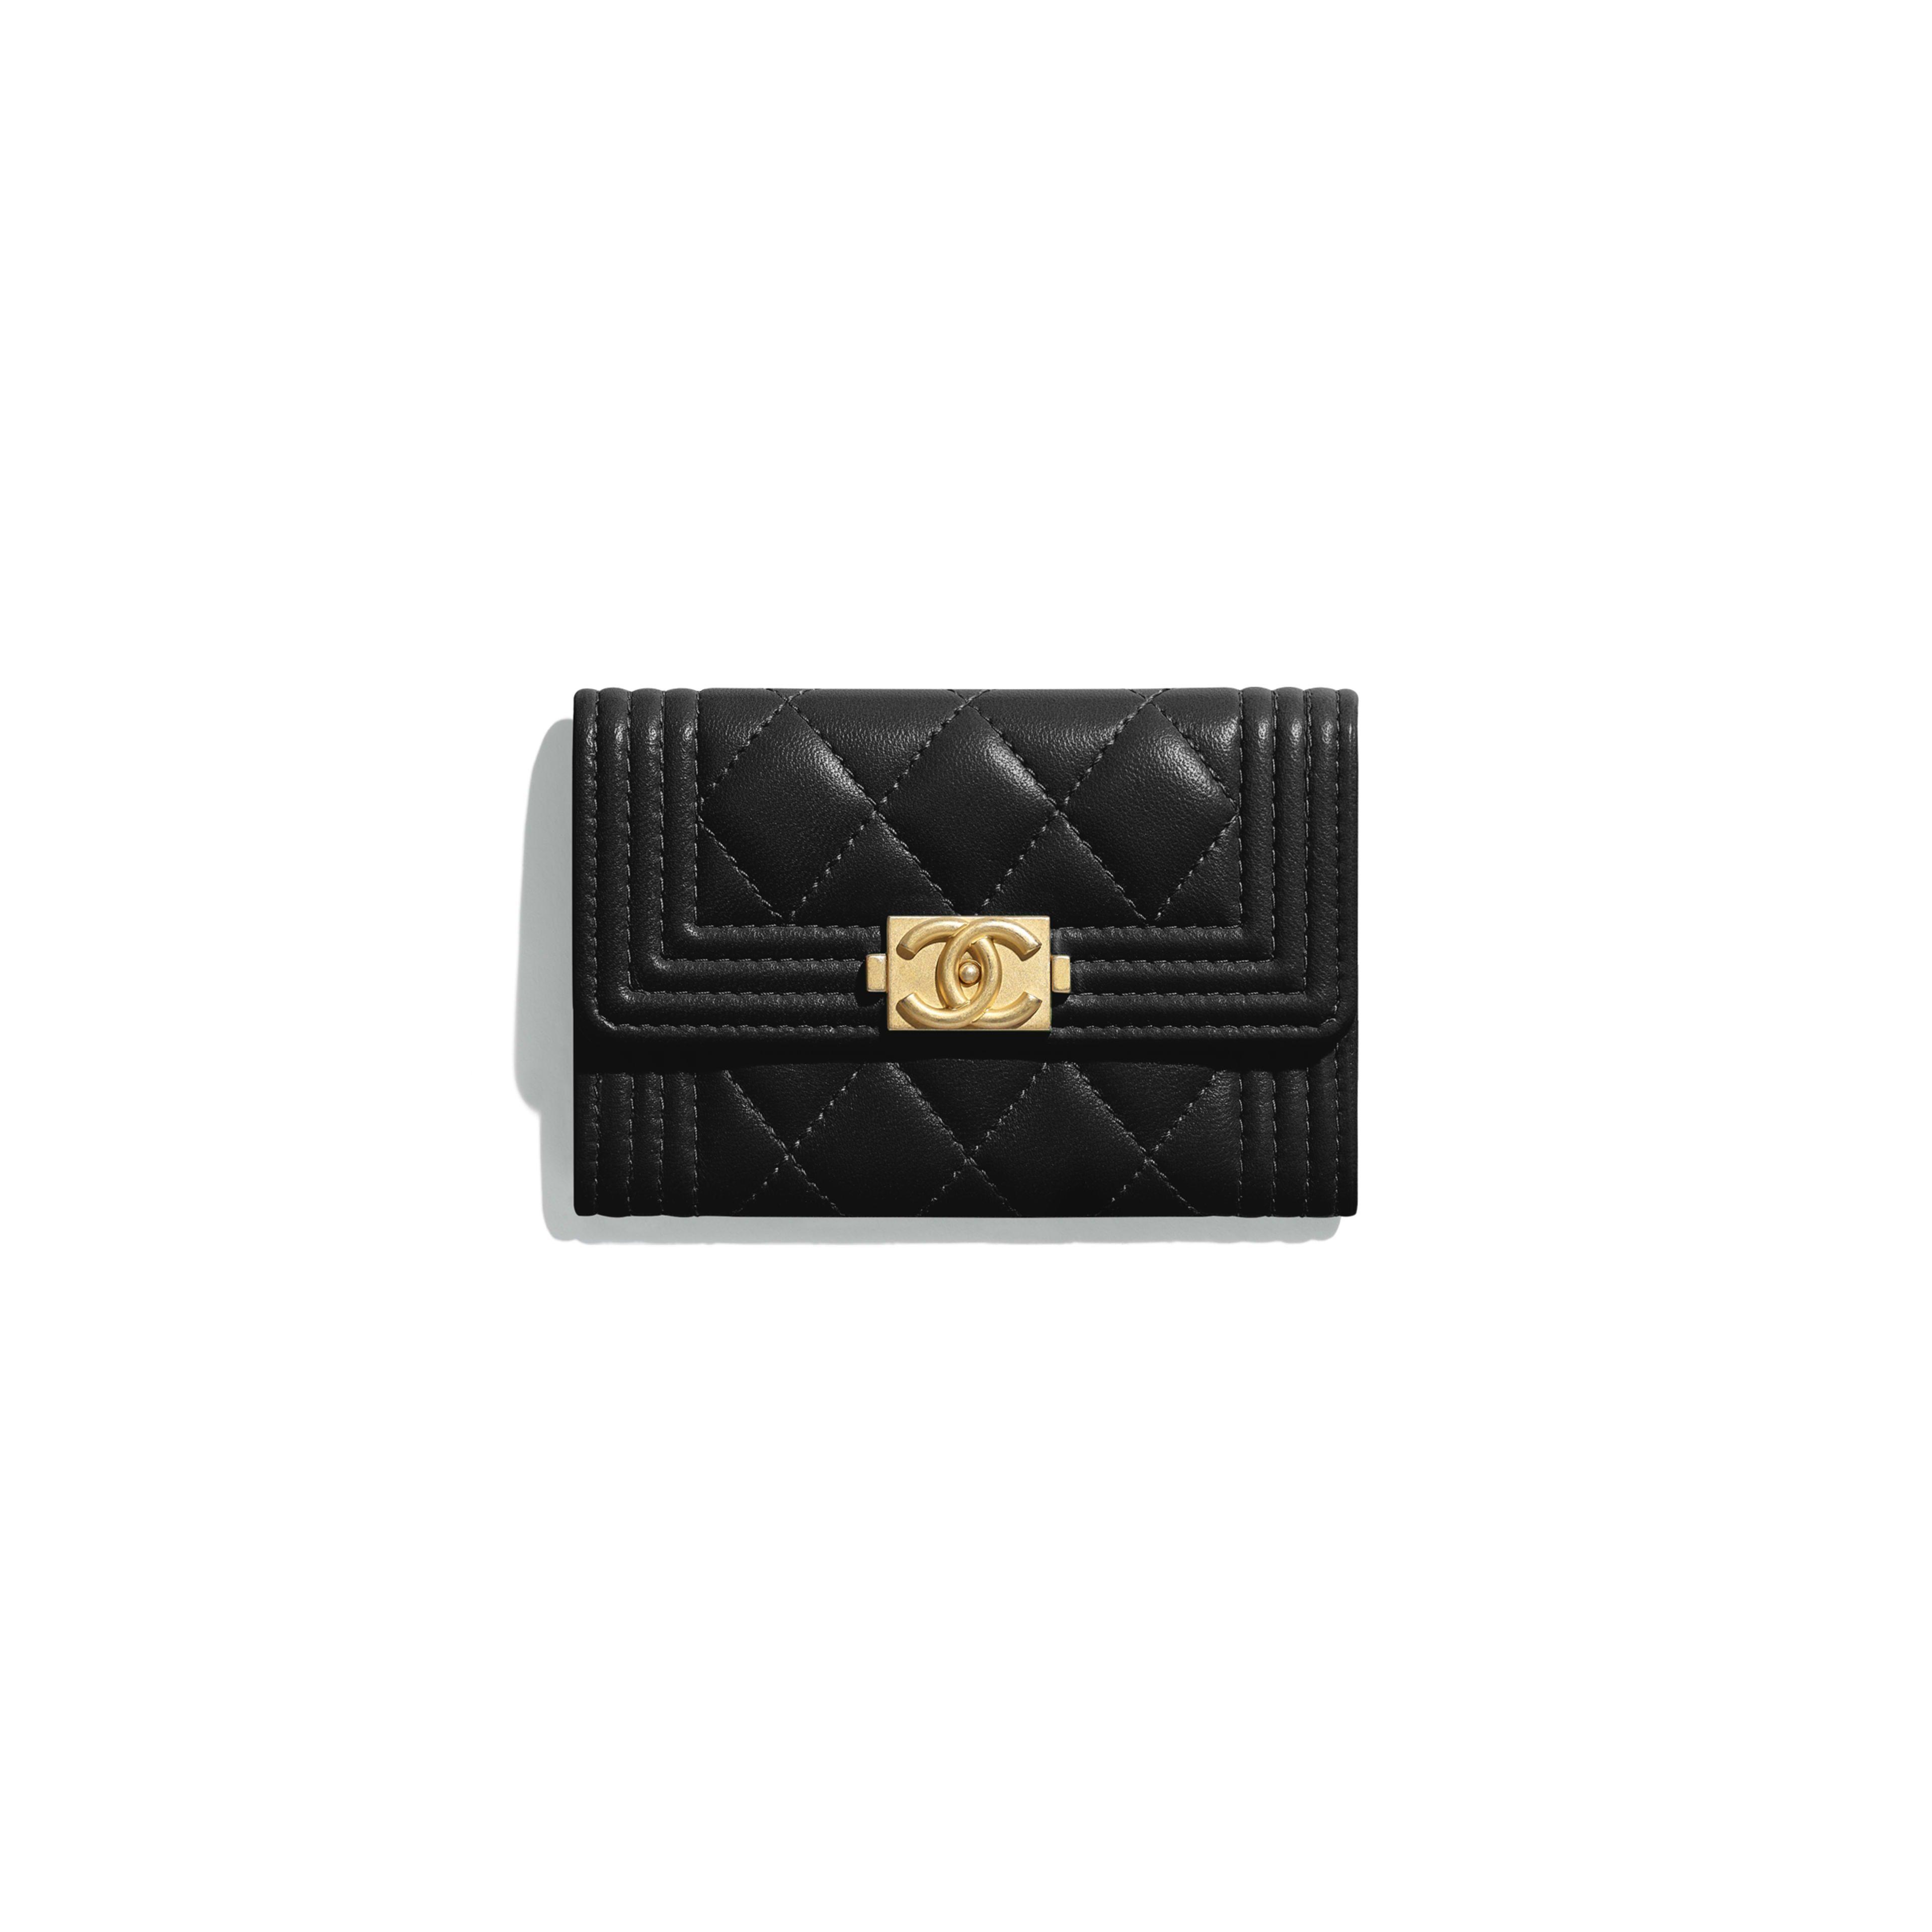 5dd01de8f Chanel Flap Coin Purse | Why Collectors Love Chanel Handbags Christie S